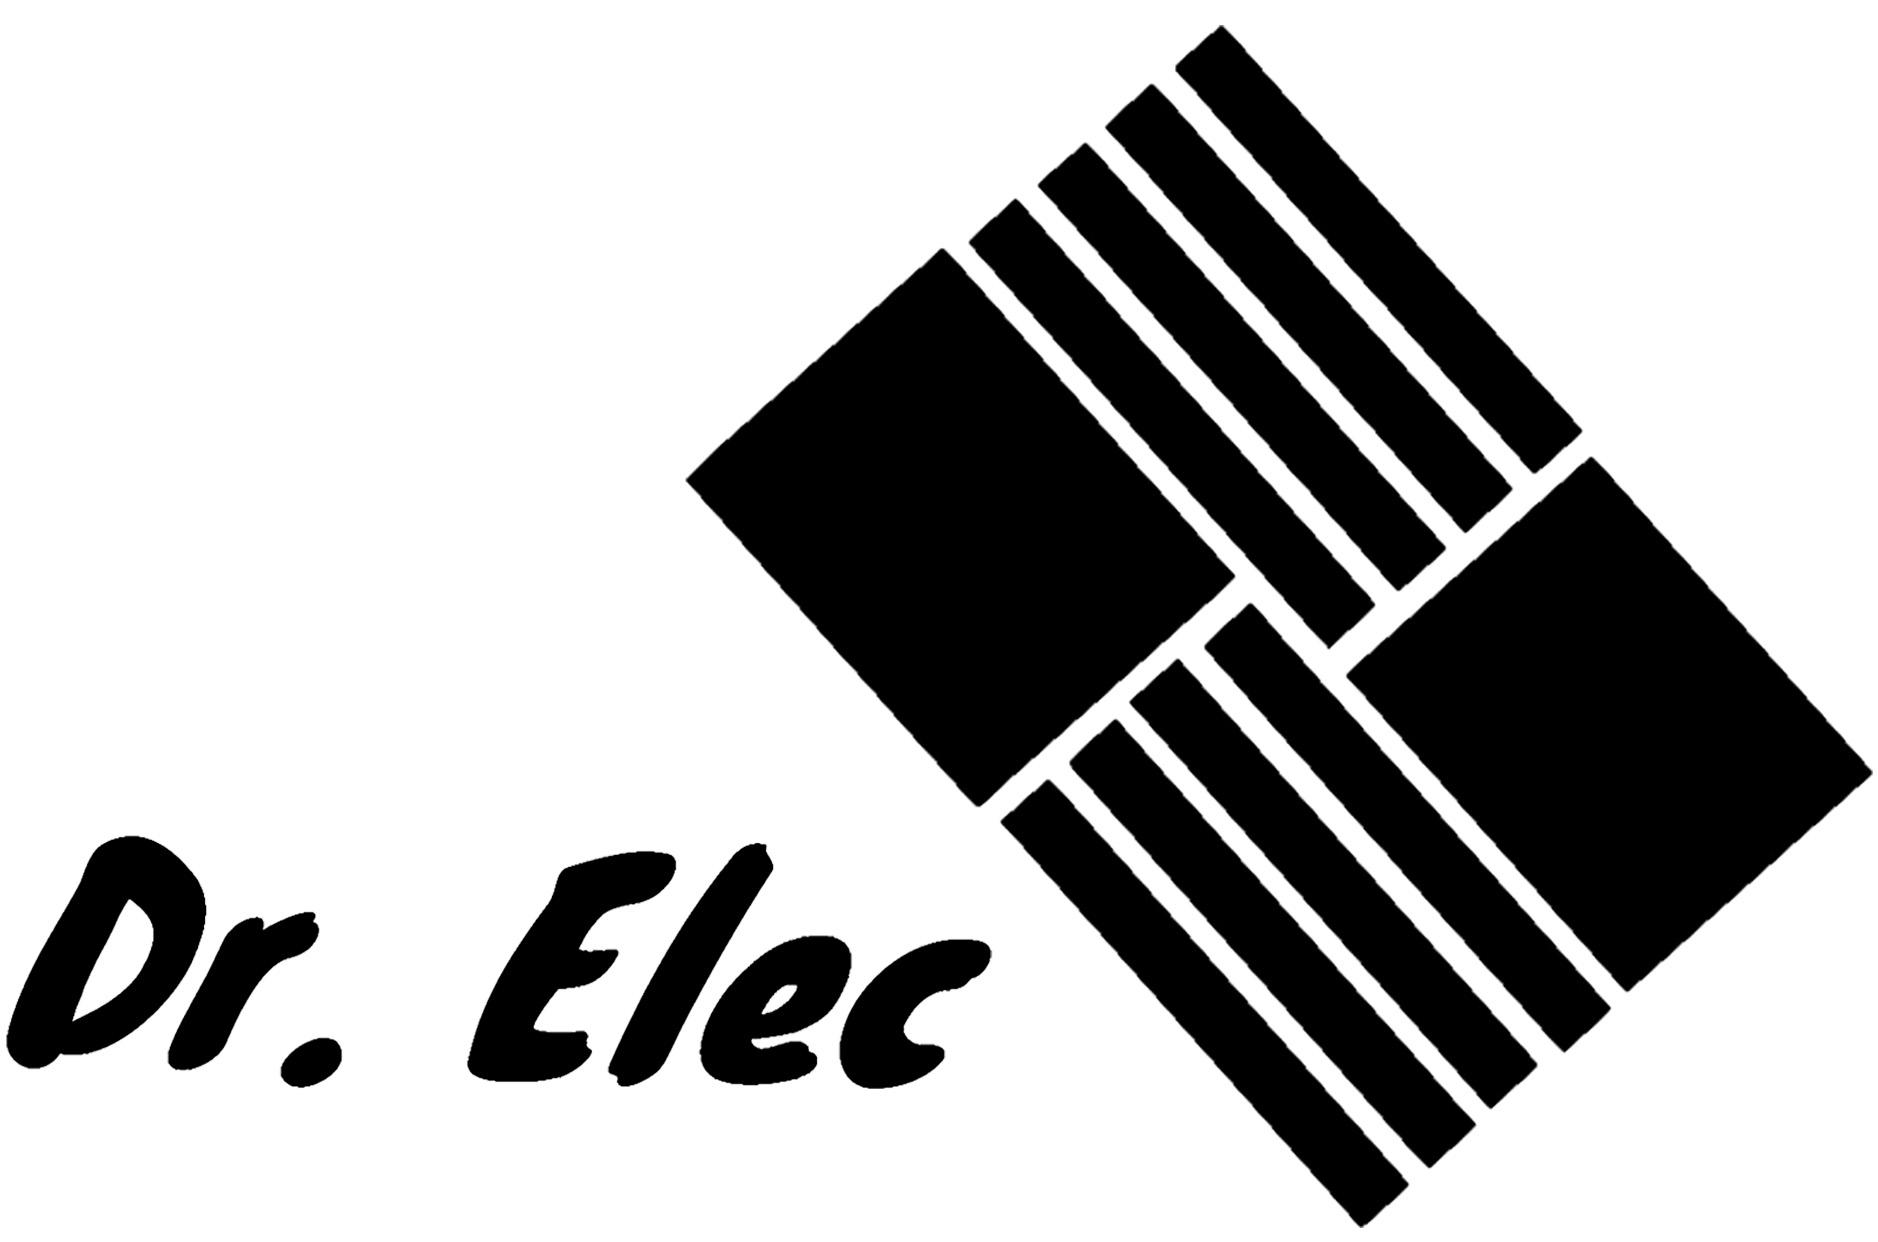 دکتر الکترونیک